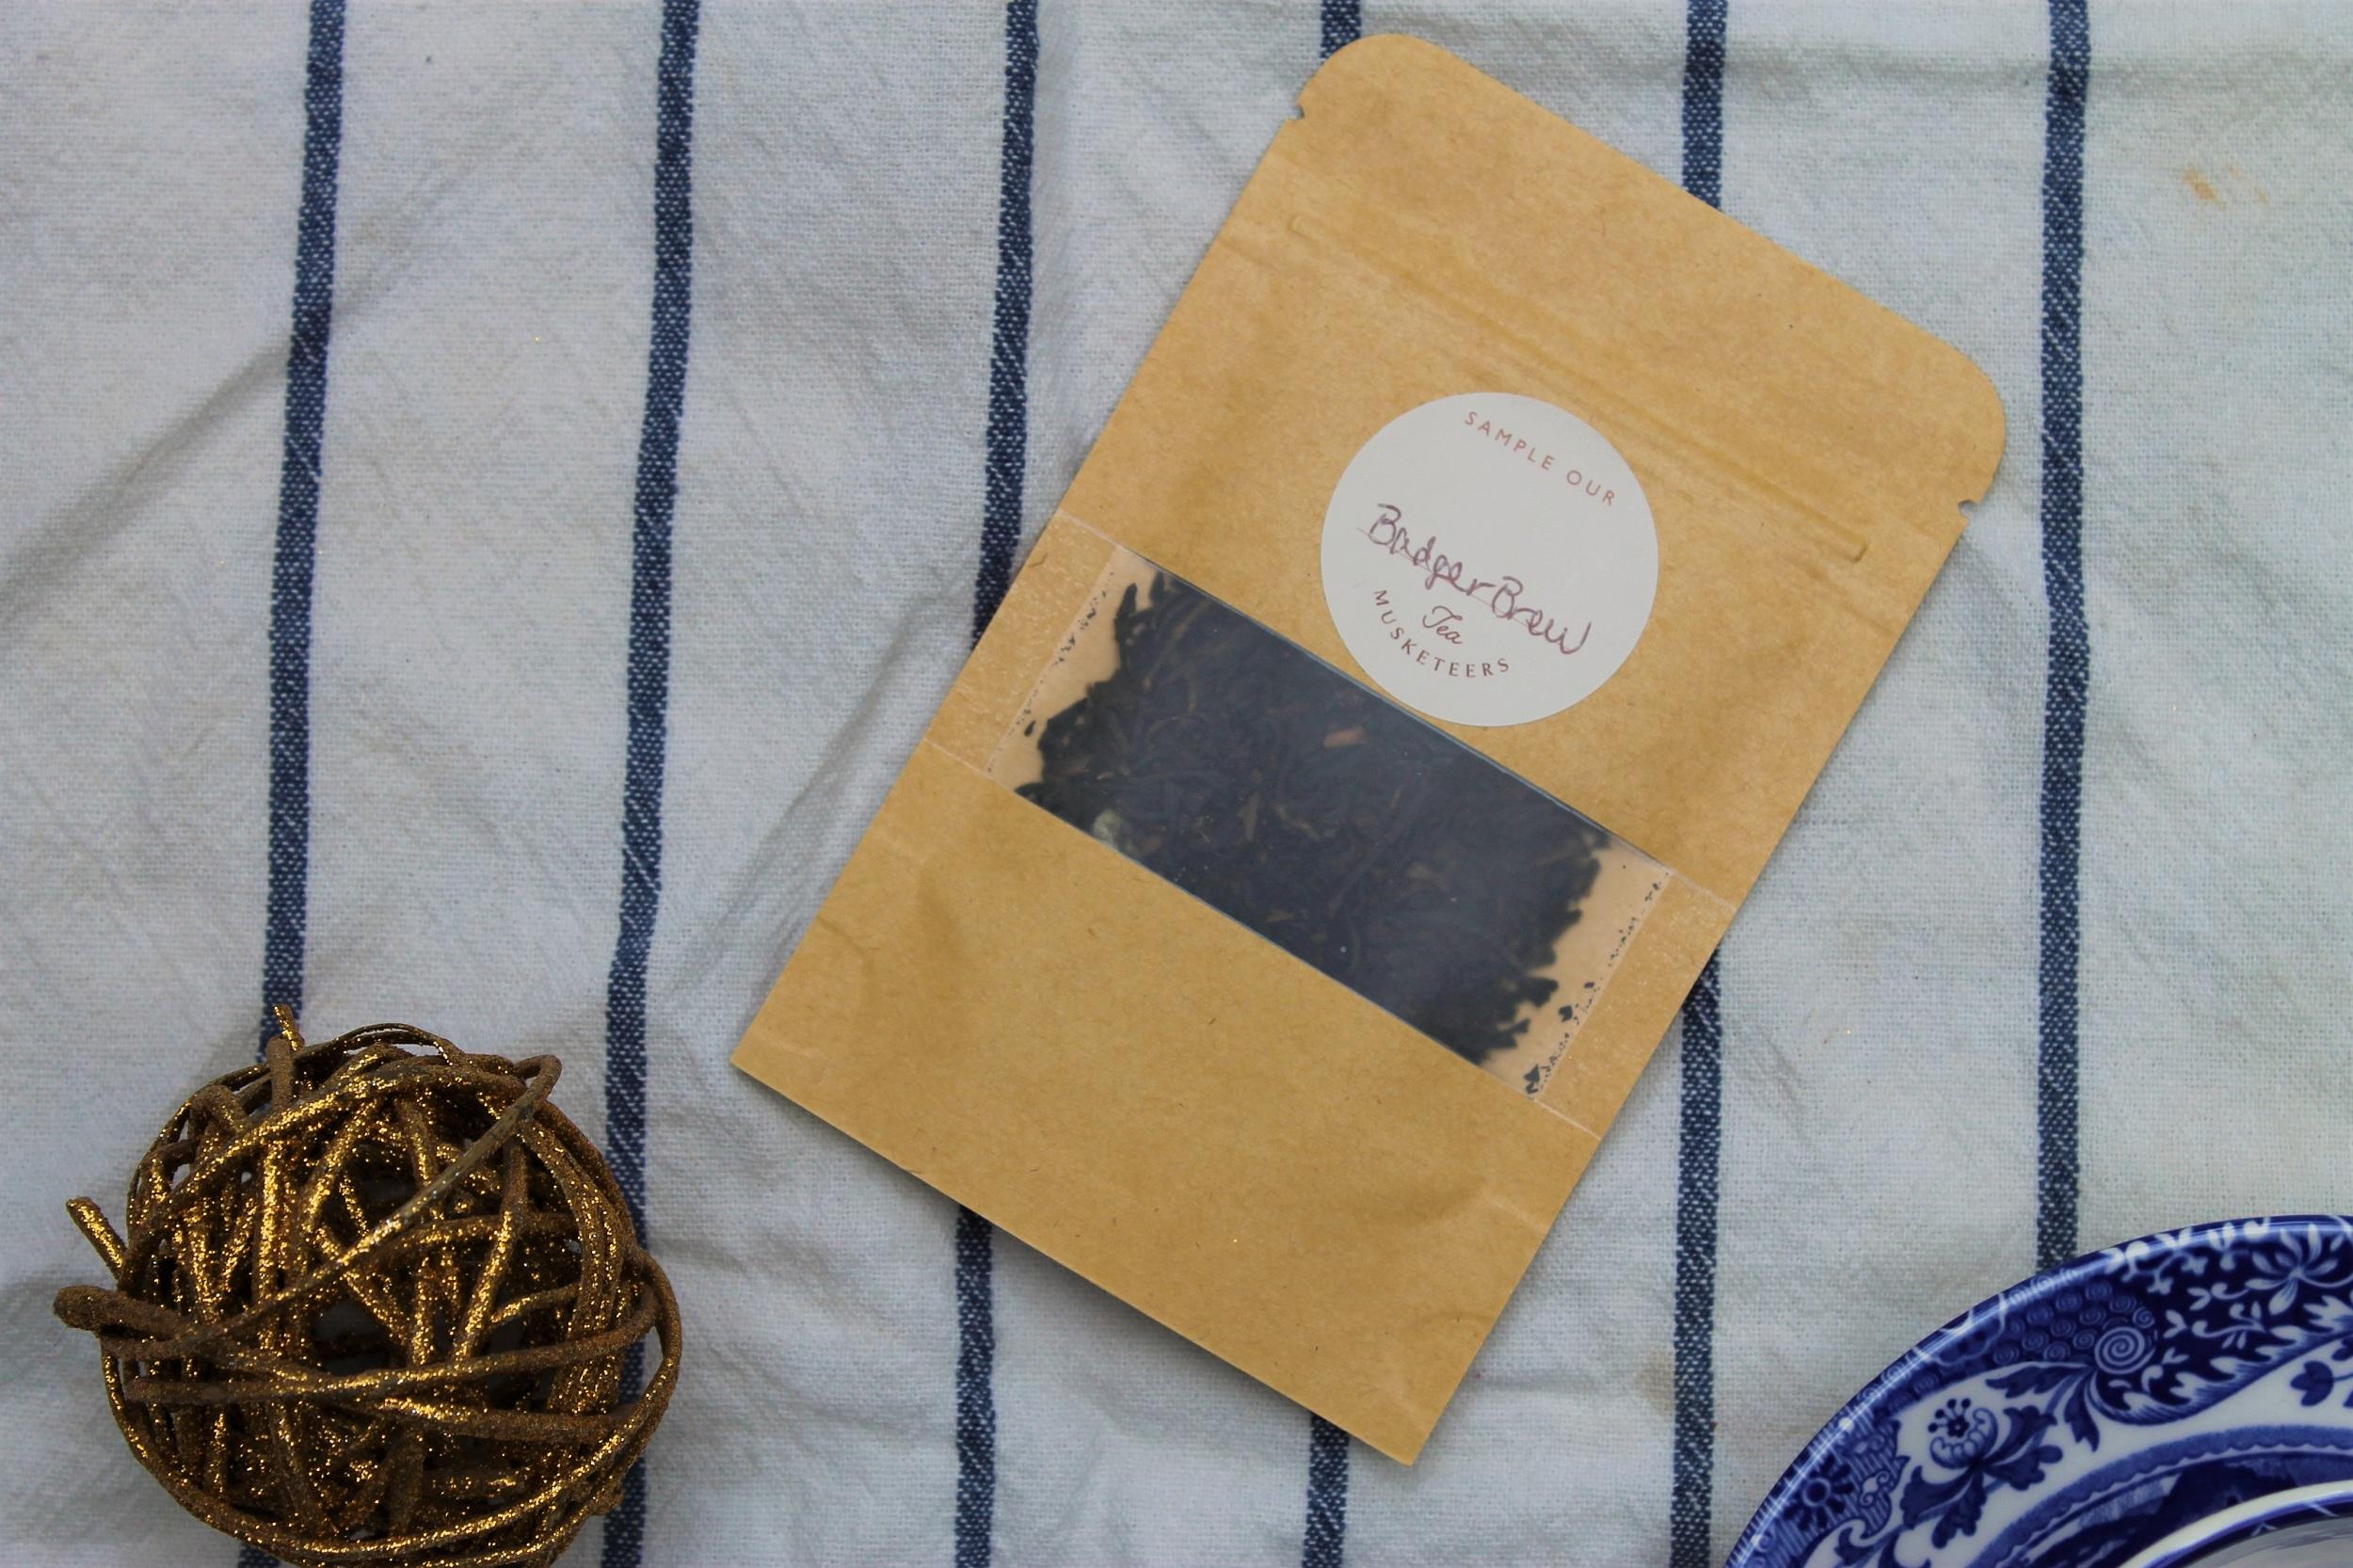 badger brew loose leaf tea pouch